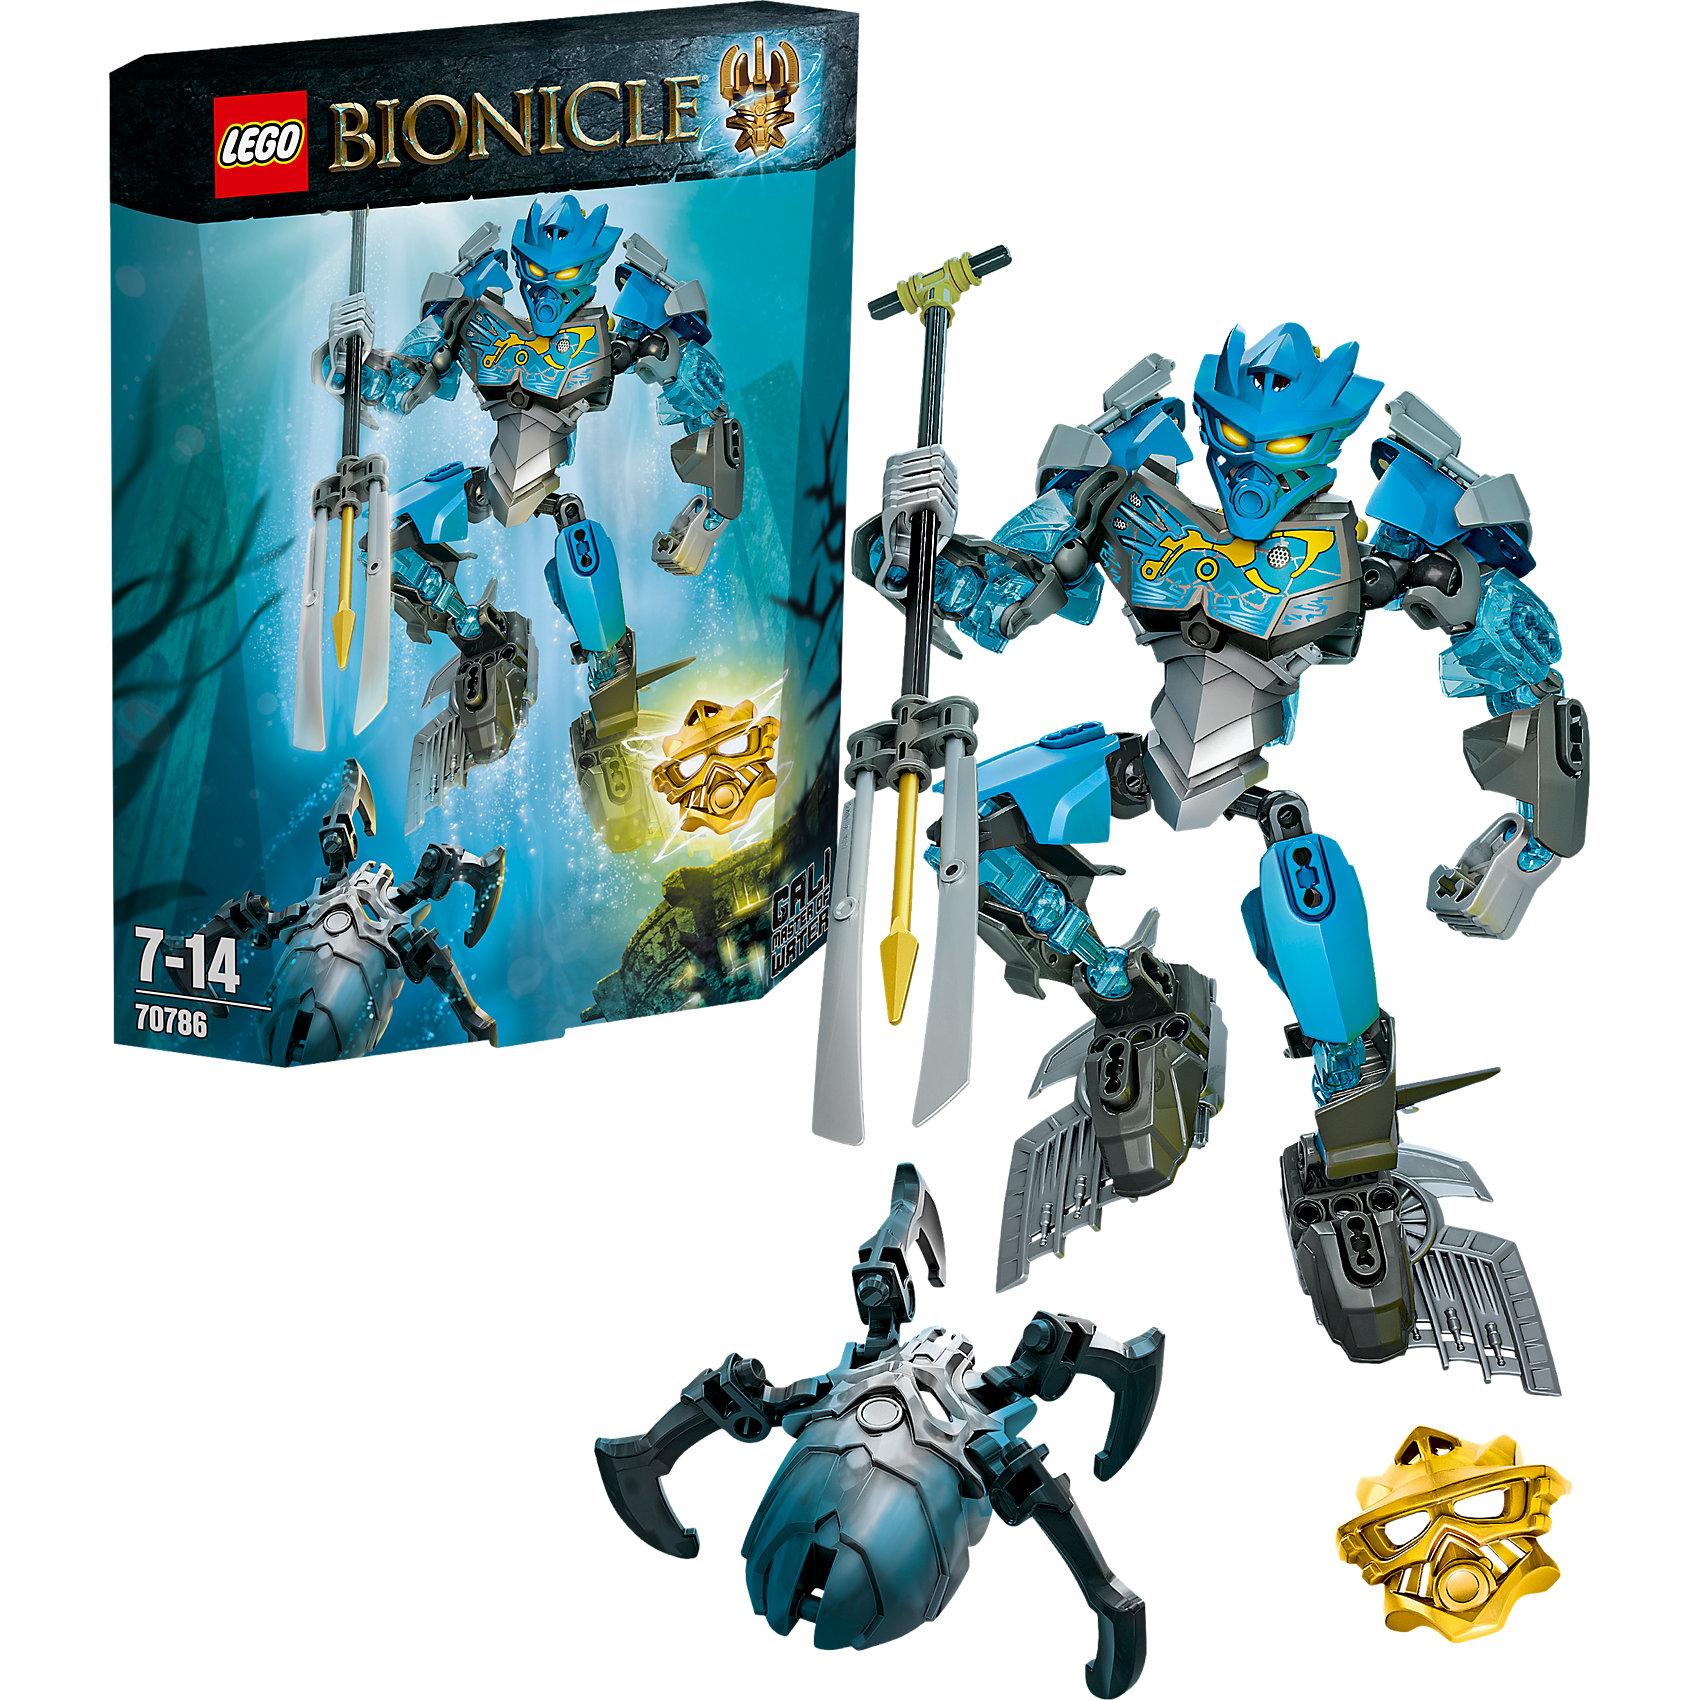 LEGO Bionicle 70786: Гали – Повелительница Воды